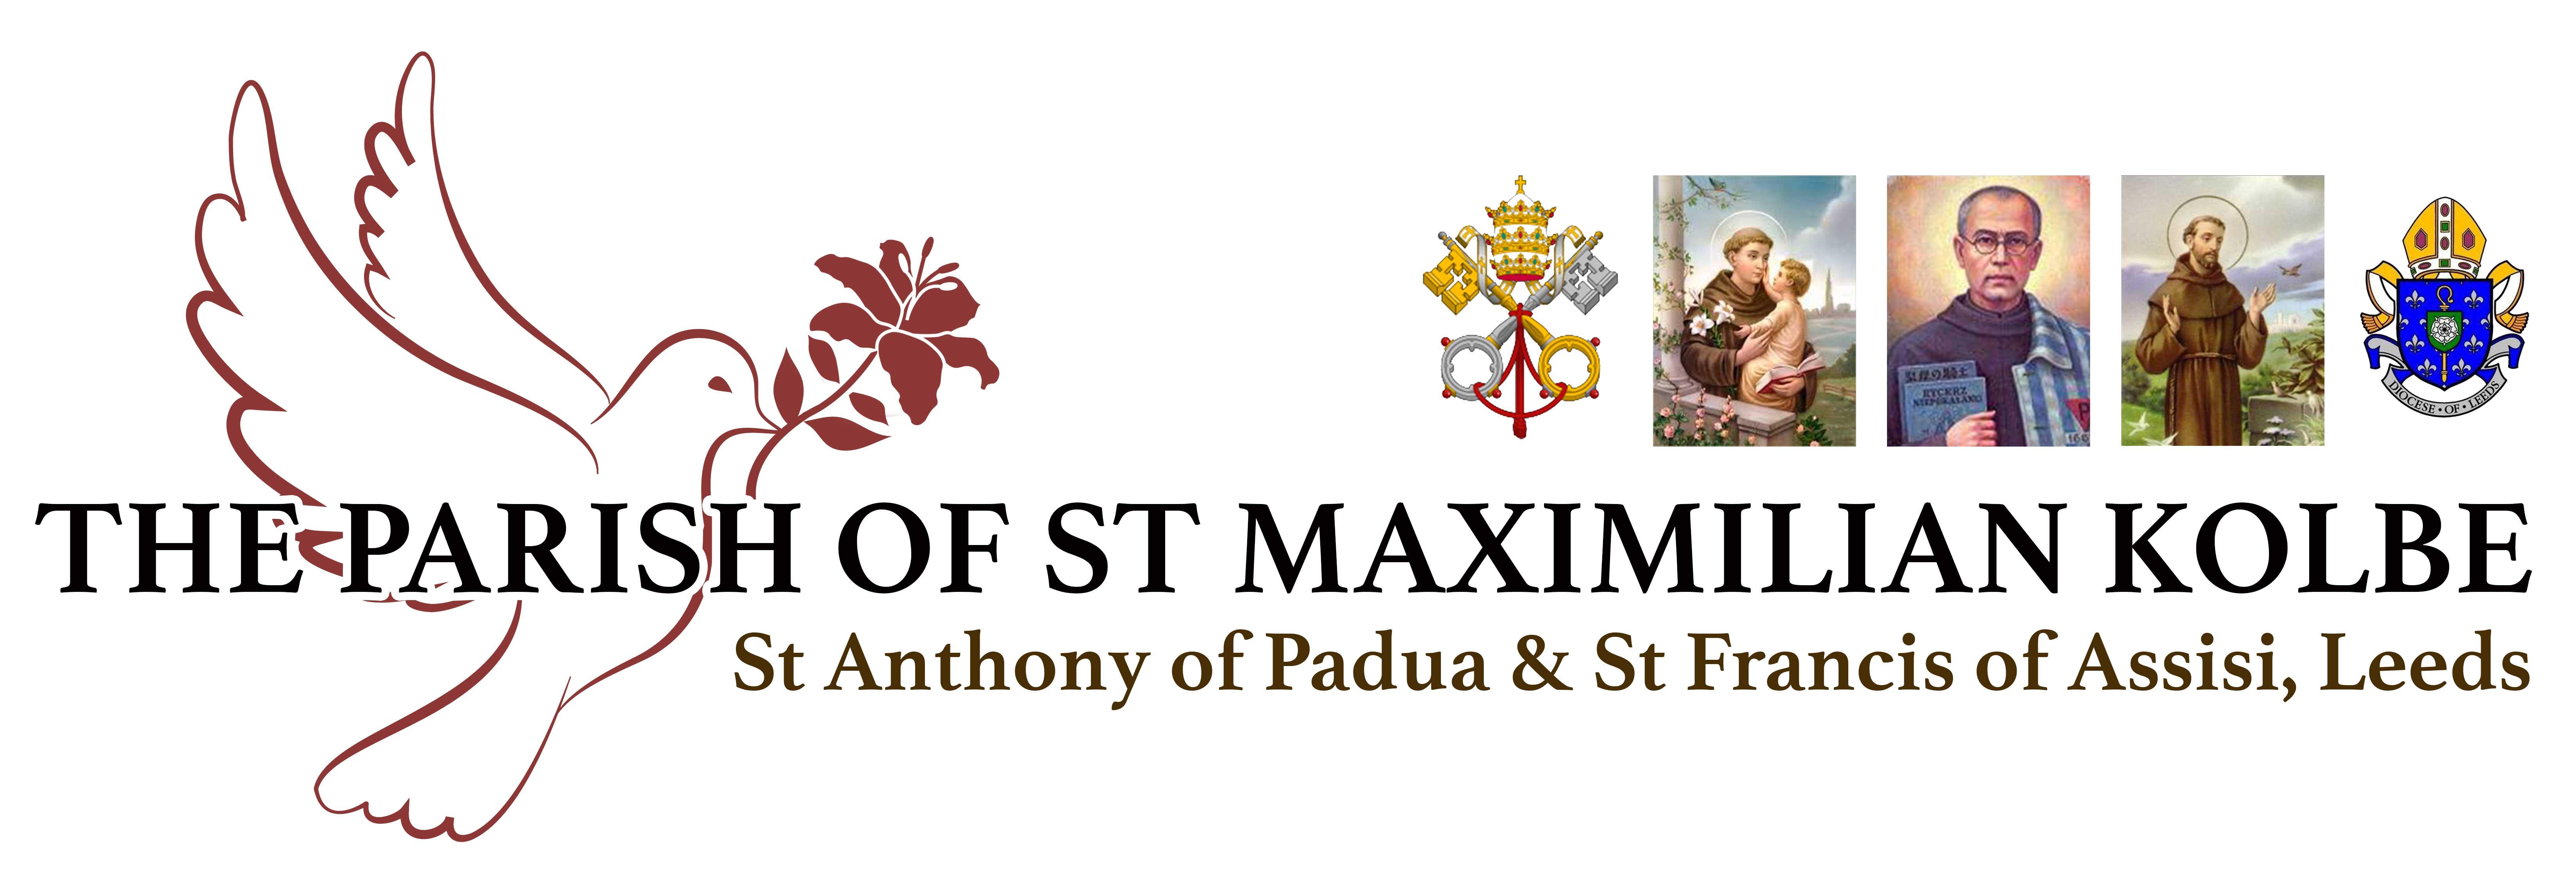 Logo for The Parish of St Maximilian Kolbe, Leeds